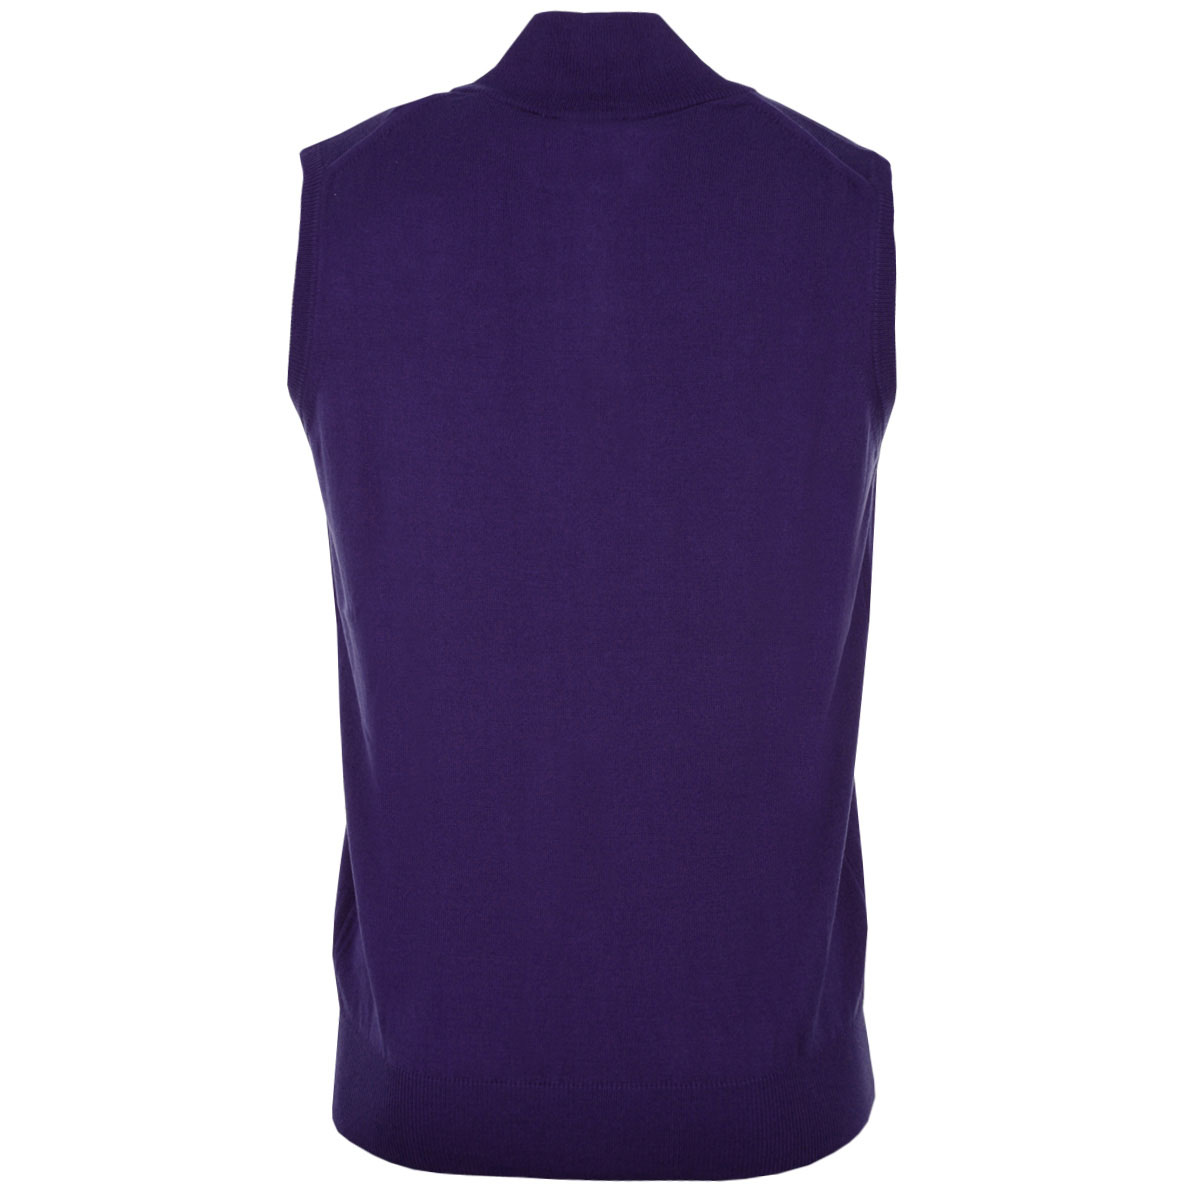 Calvin-Klein-Golf-Mens-CK-1-4-Zip-Sleeveless-Sweater-Vest-Gilet-27-OFF-RRP thumbnail 21